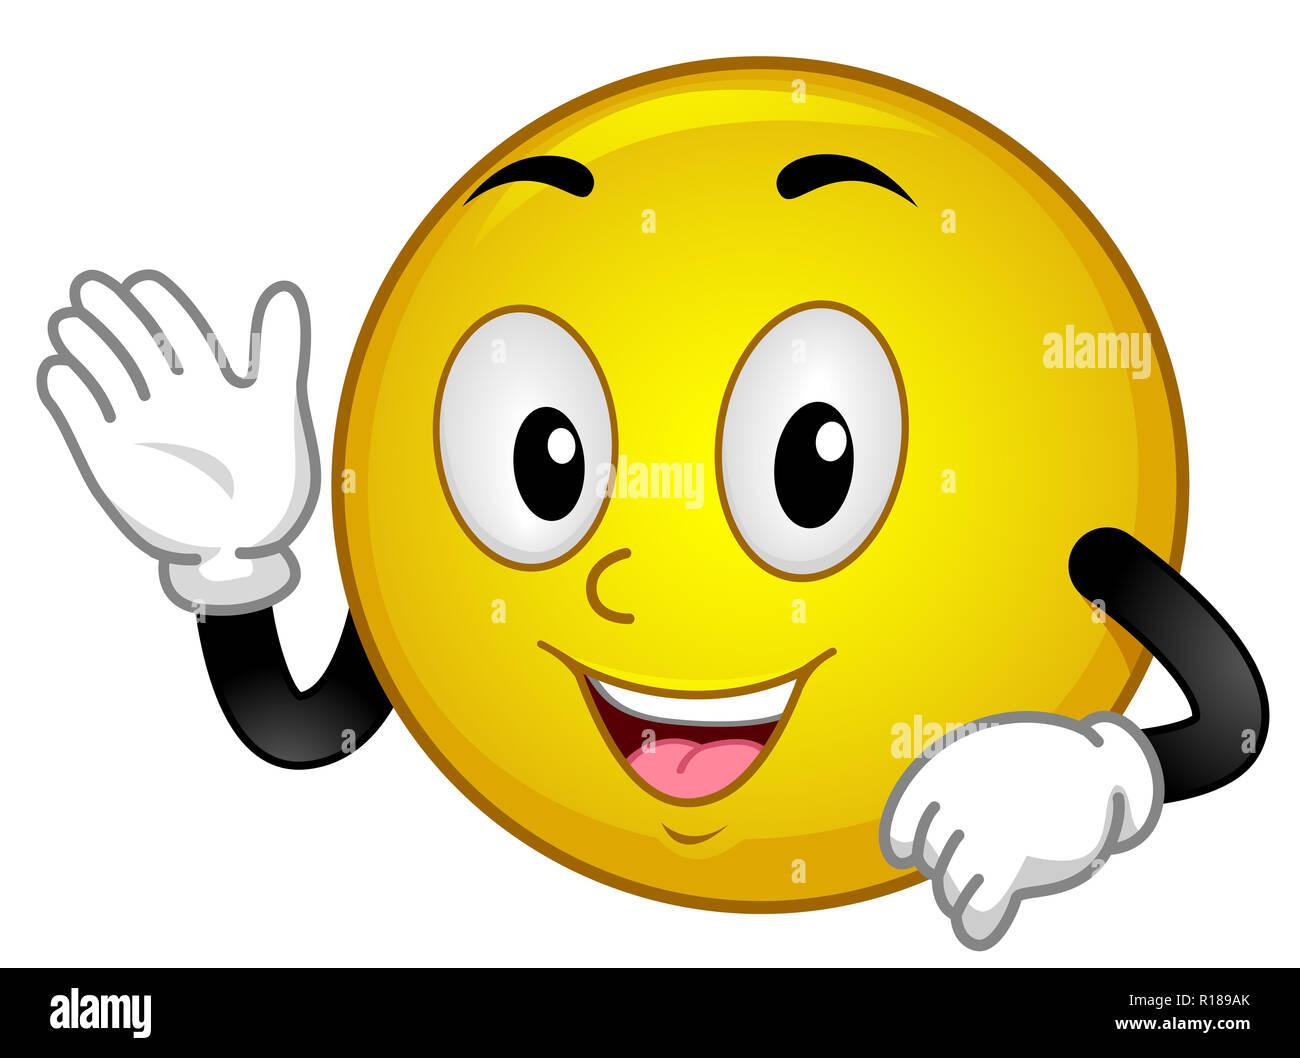 Hände smiley winkende Emoji Bedeutung: